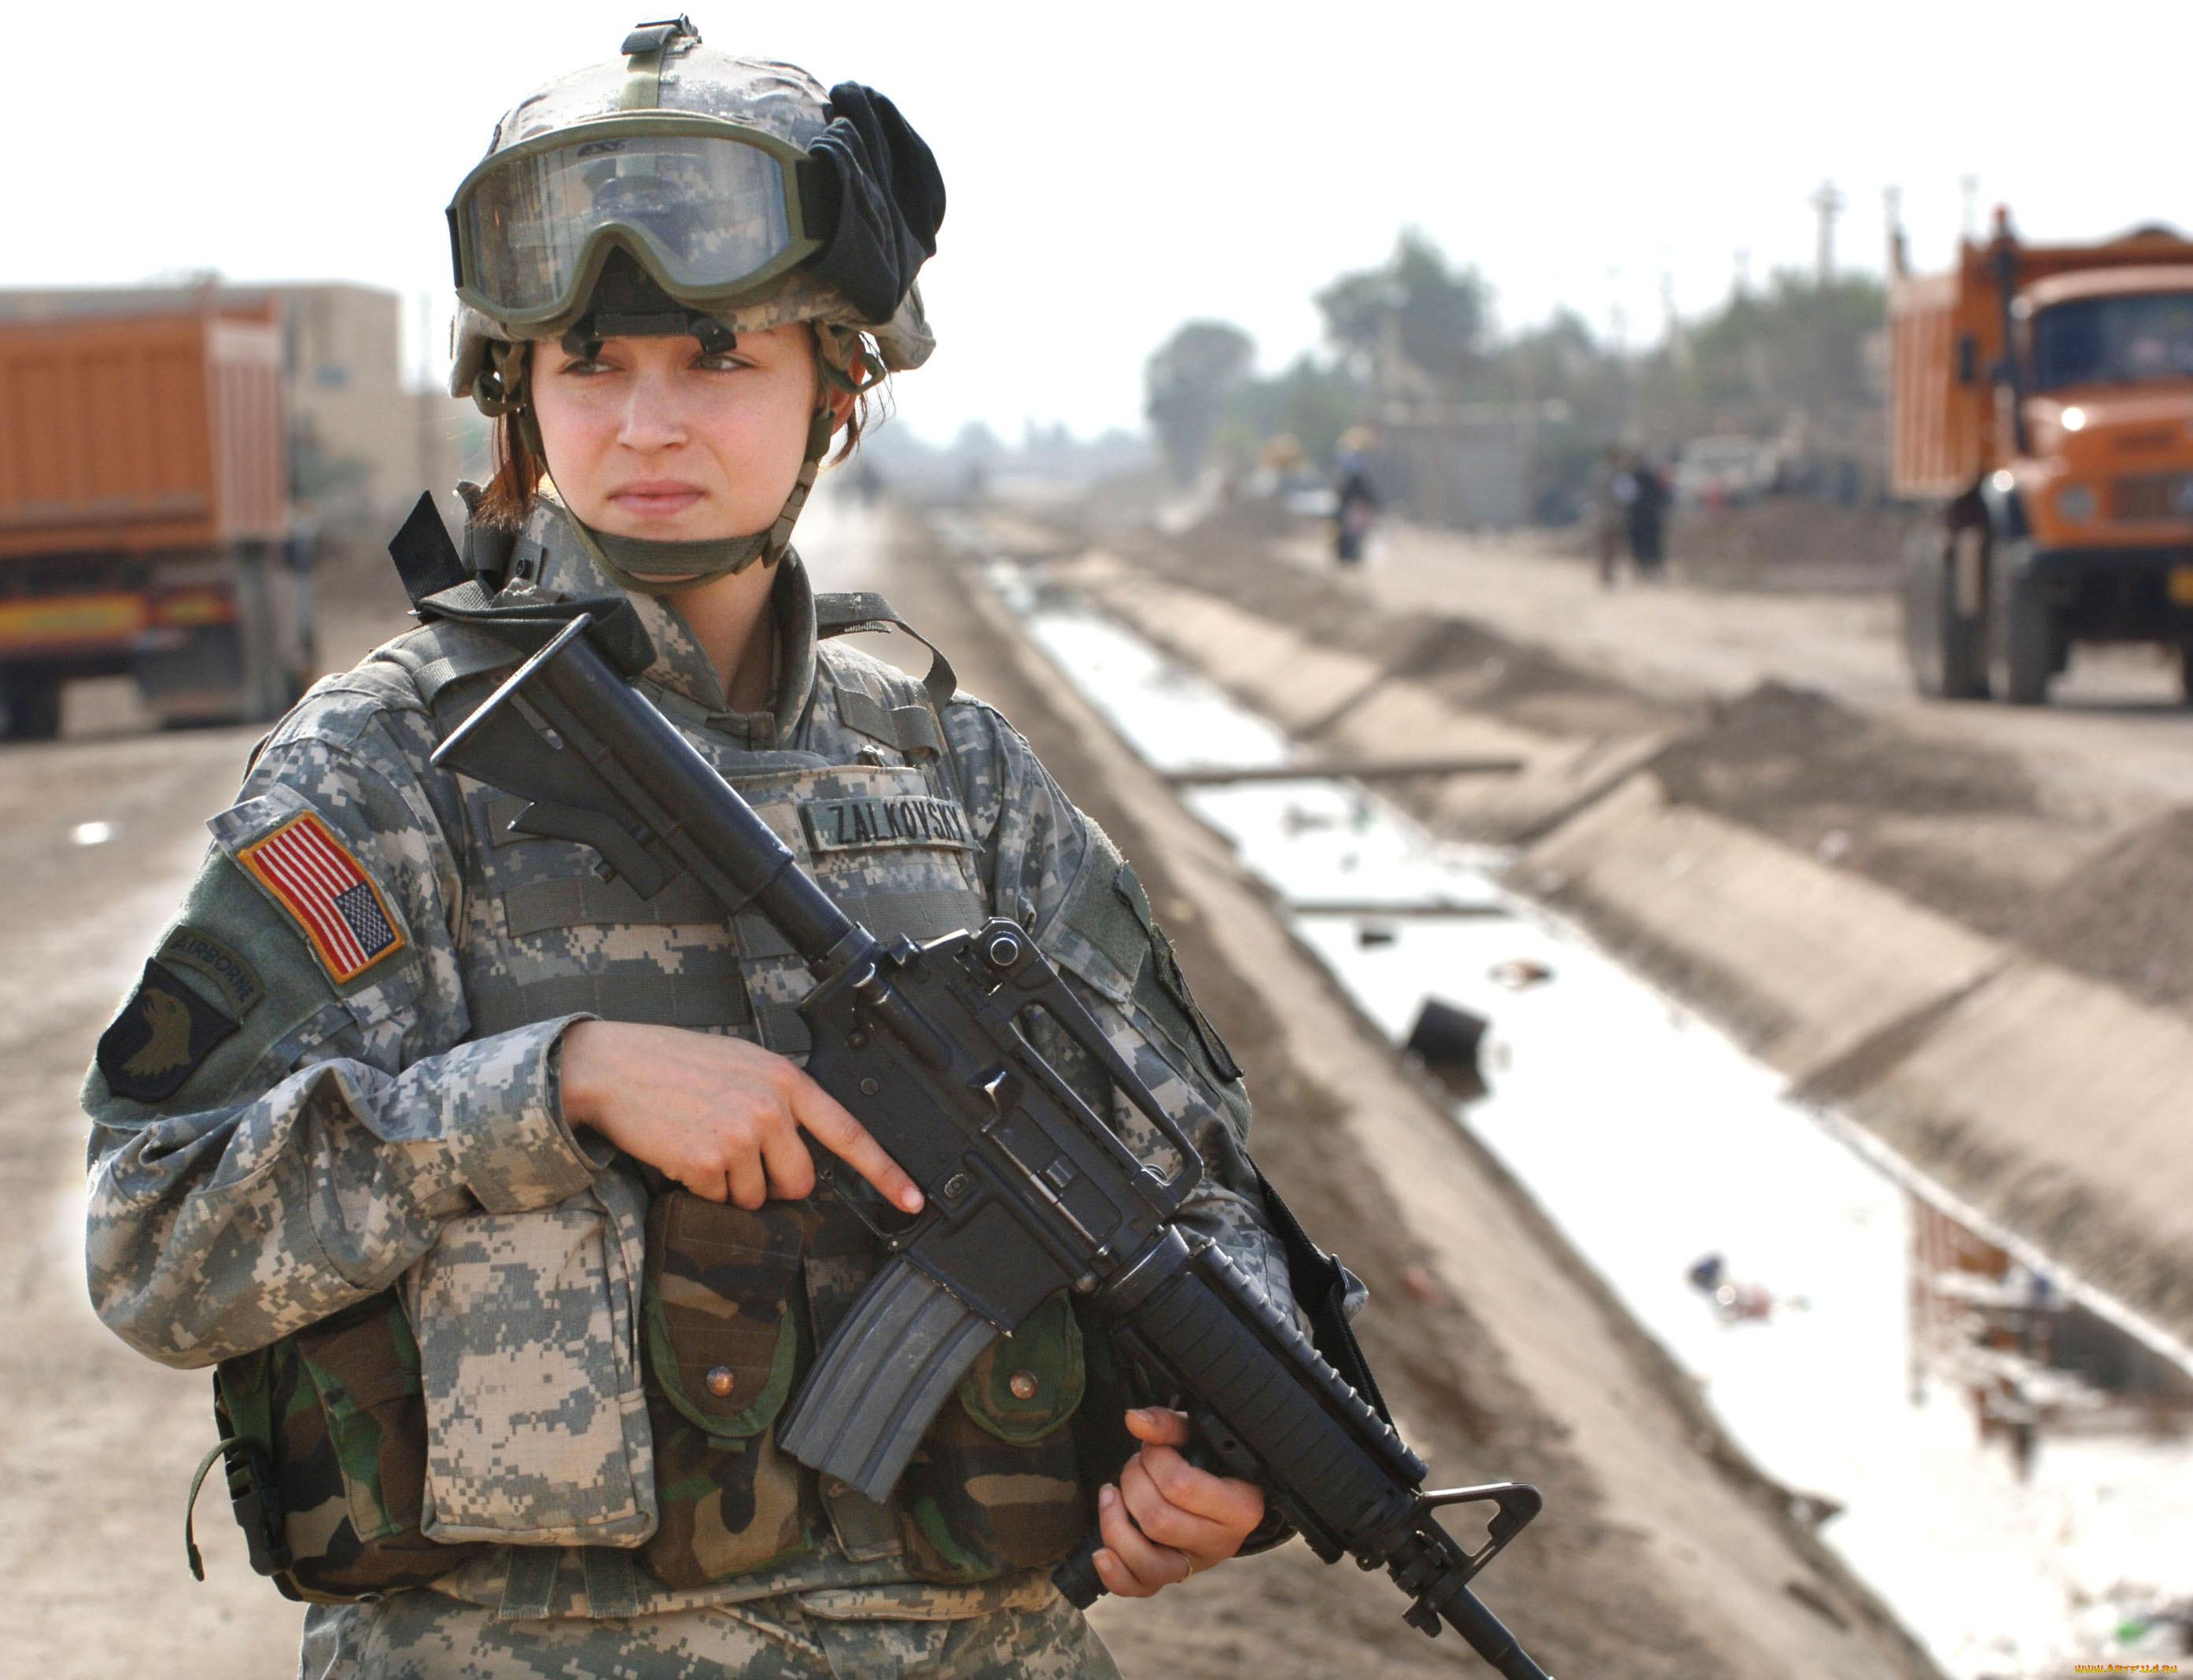 Секс иракски женщина американски солдат 3 фотография